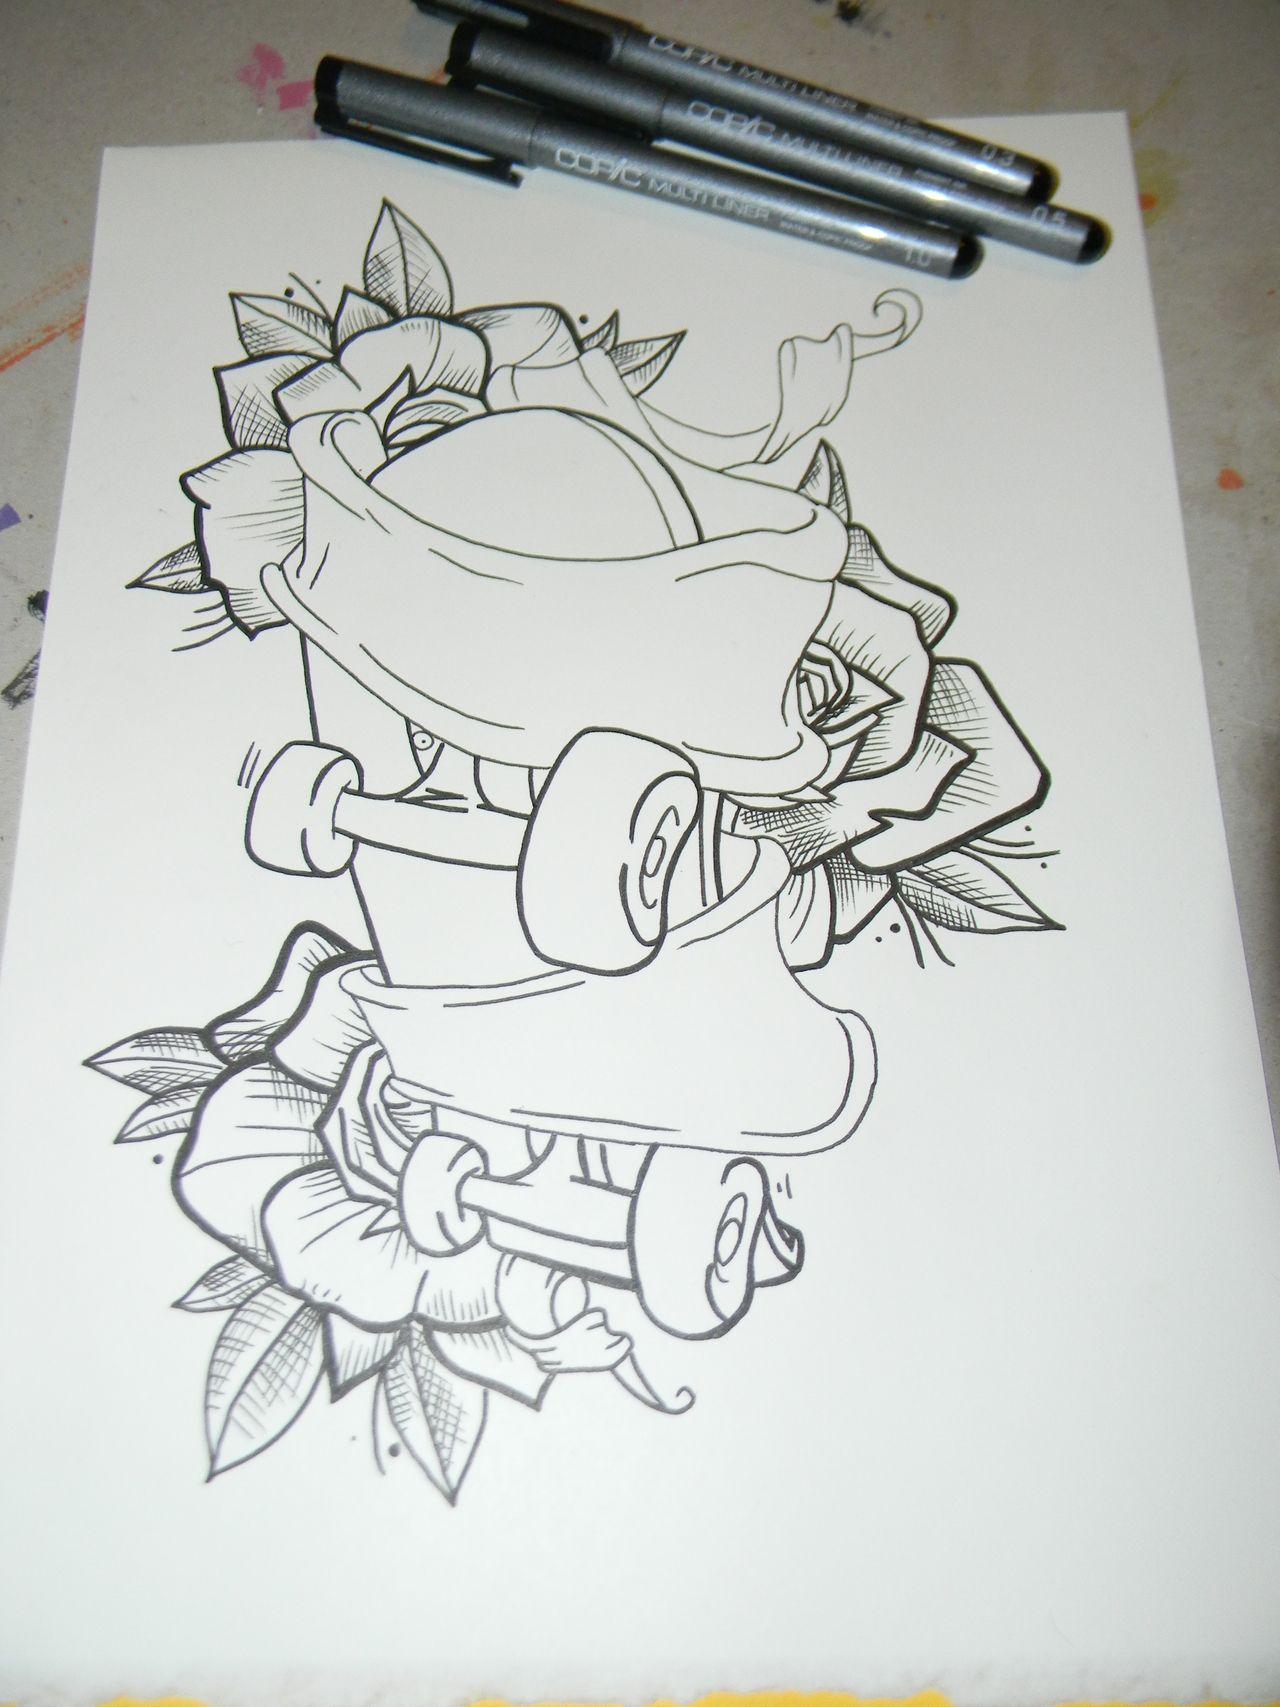 skateboard tattoo drawings art of muecke tattoos custom roller skates and rose tattoo. Black Bedroom Furniture Sets. Home Design Ideas